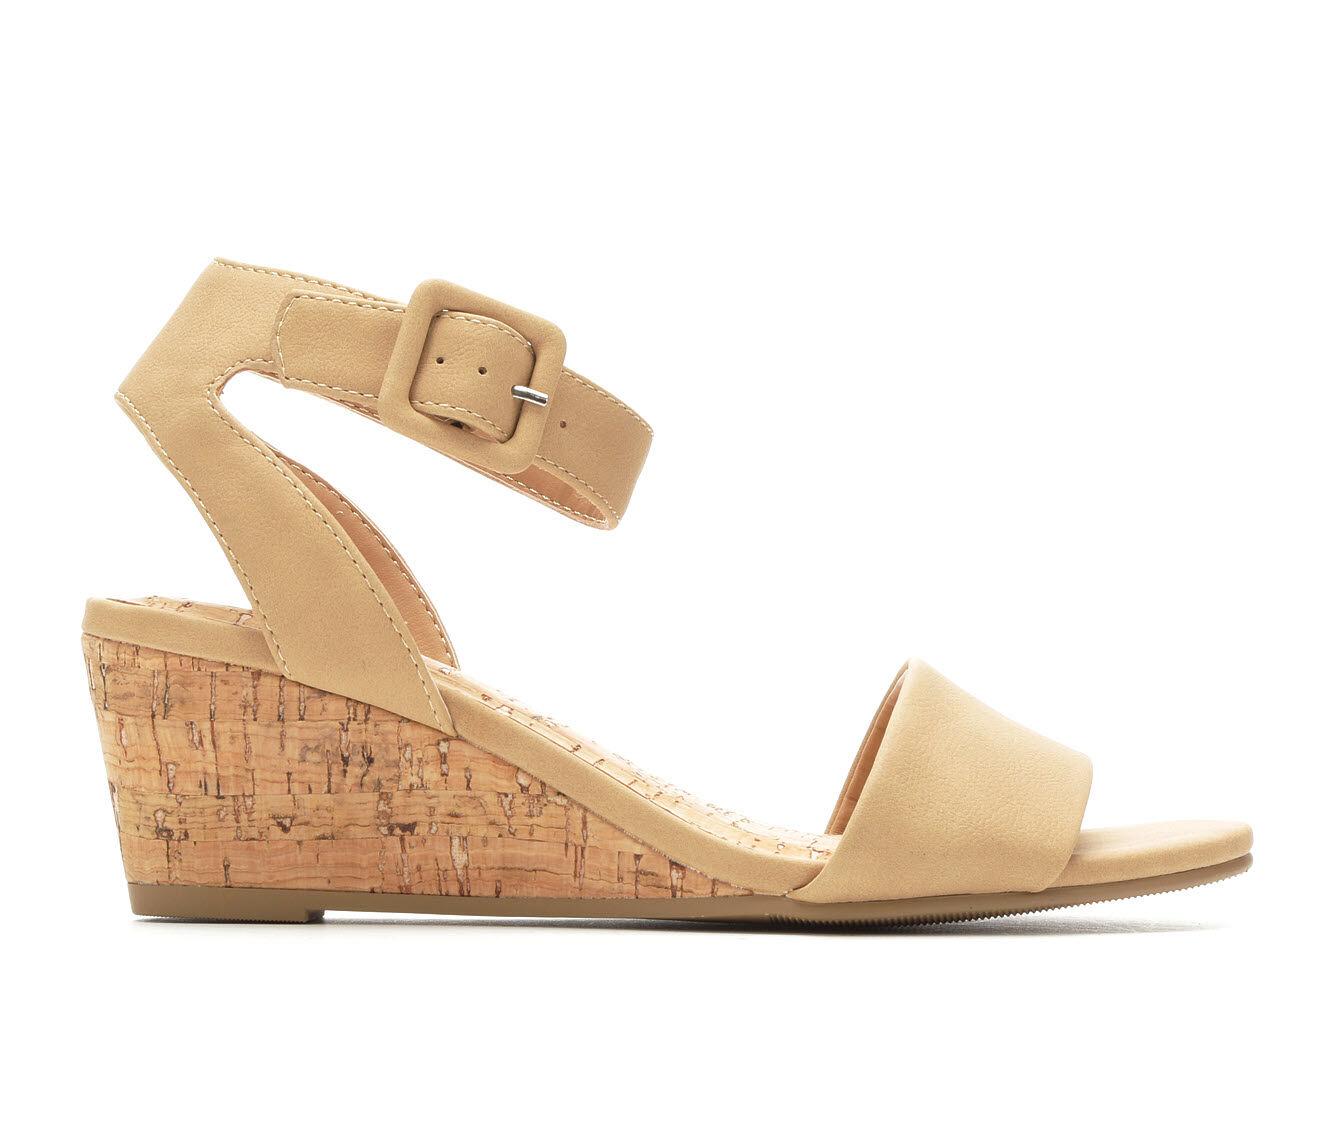 Speical Offer Women's Solanz Ellie Wedge Sandals Natural Nubuck